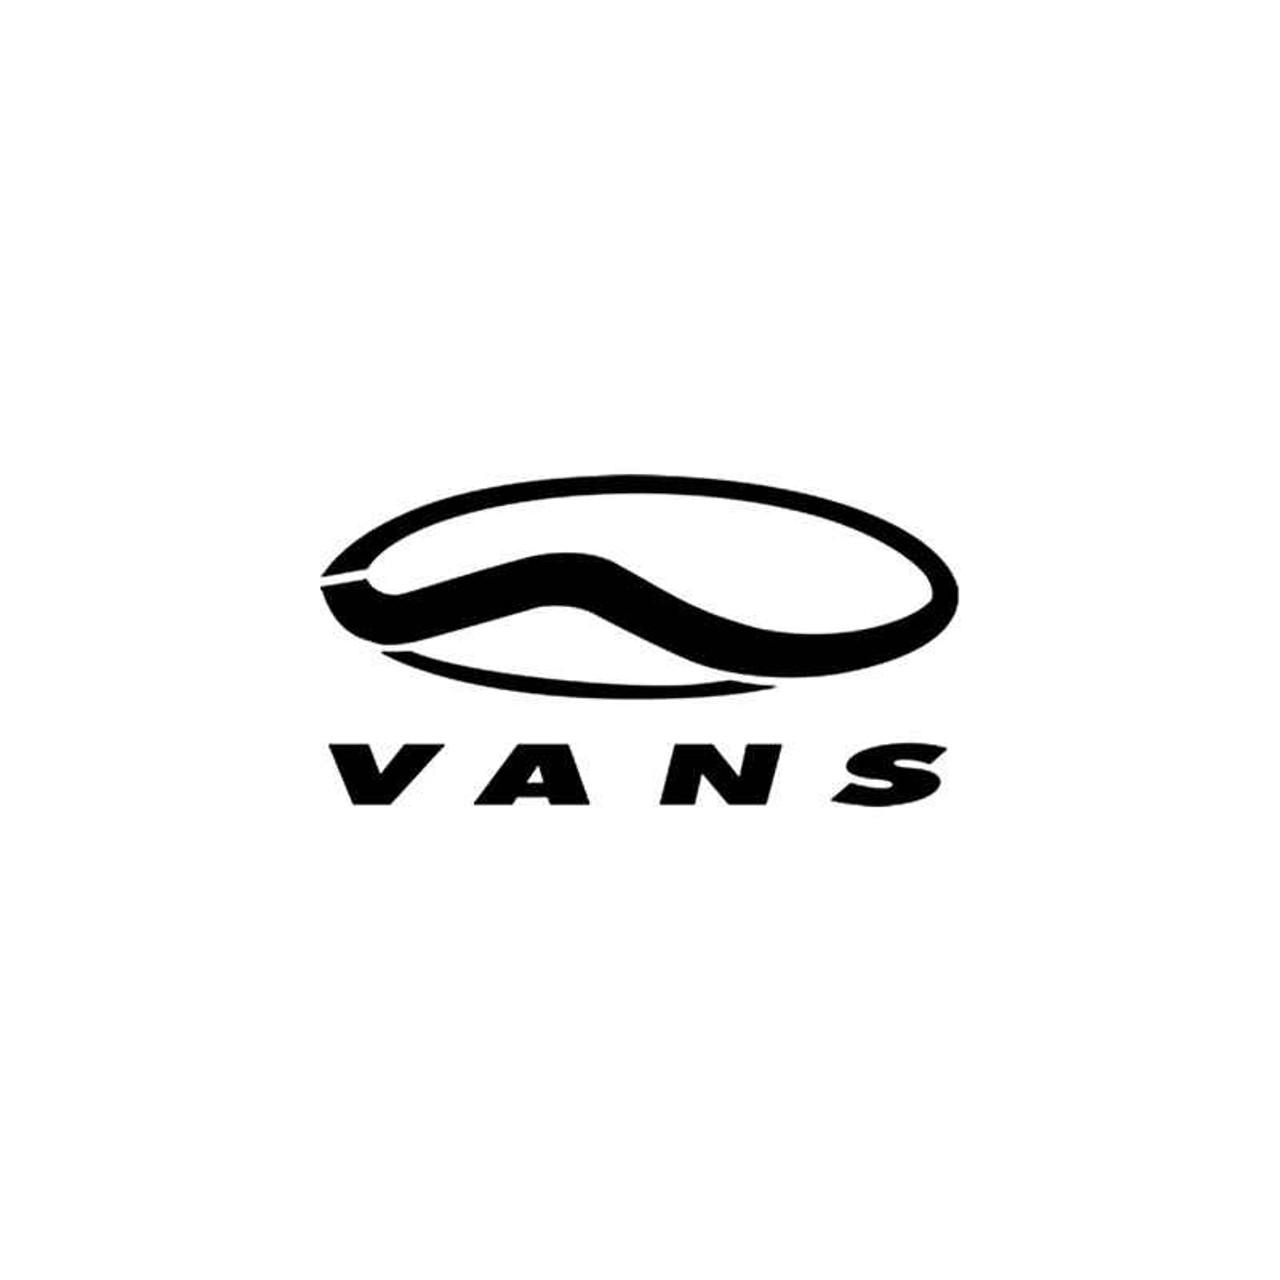 f5696e18e7 Corporate Logo s Vans Shoes Style 2 Vinyl Sticker